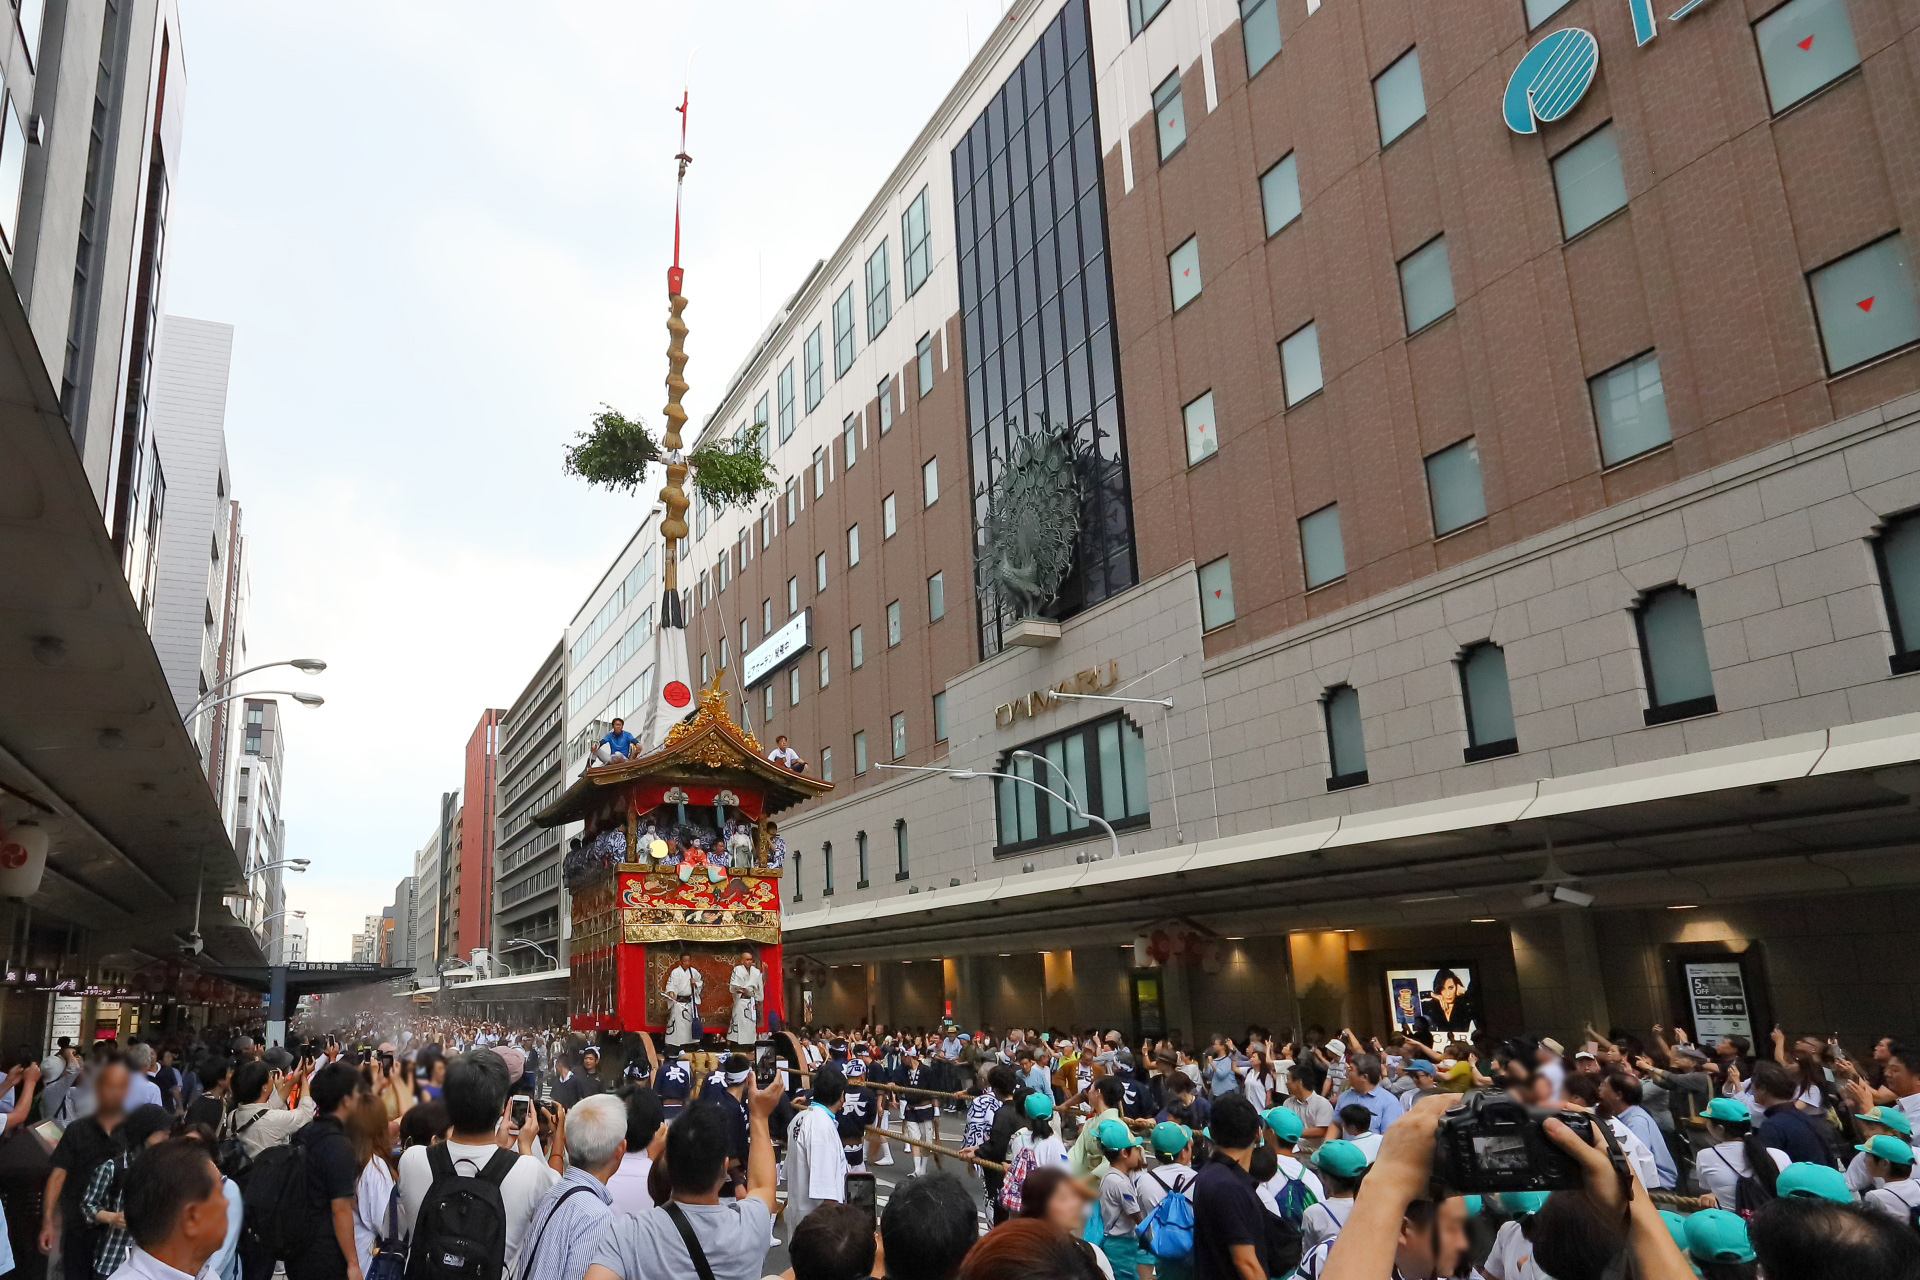 祇園祭2019前祭 鉾曳初め(長刀鉾)(京都)